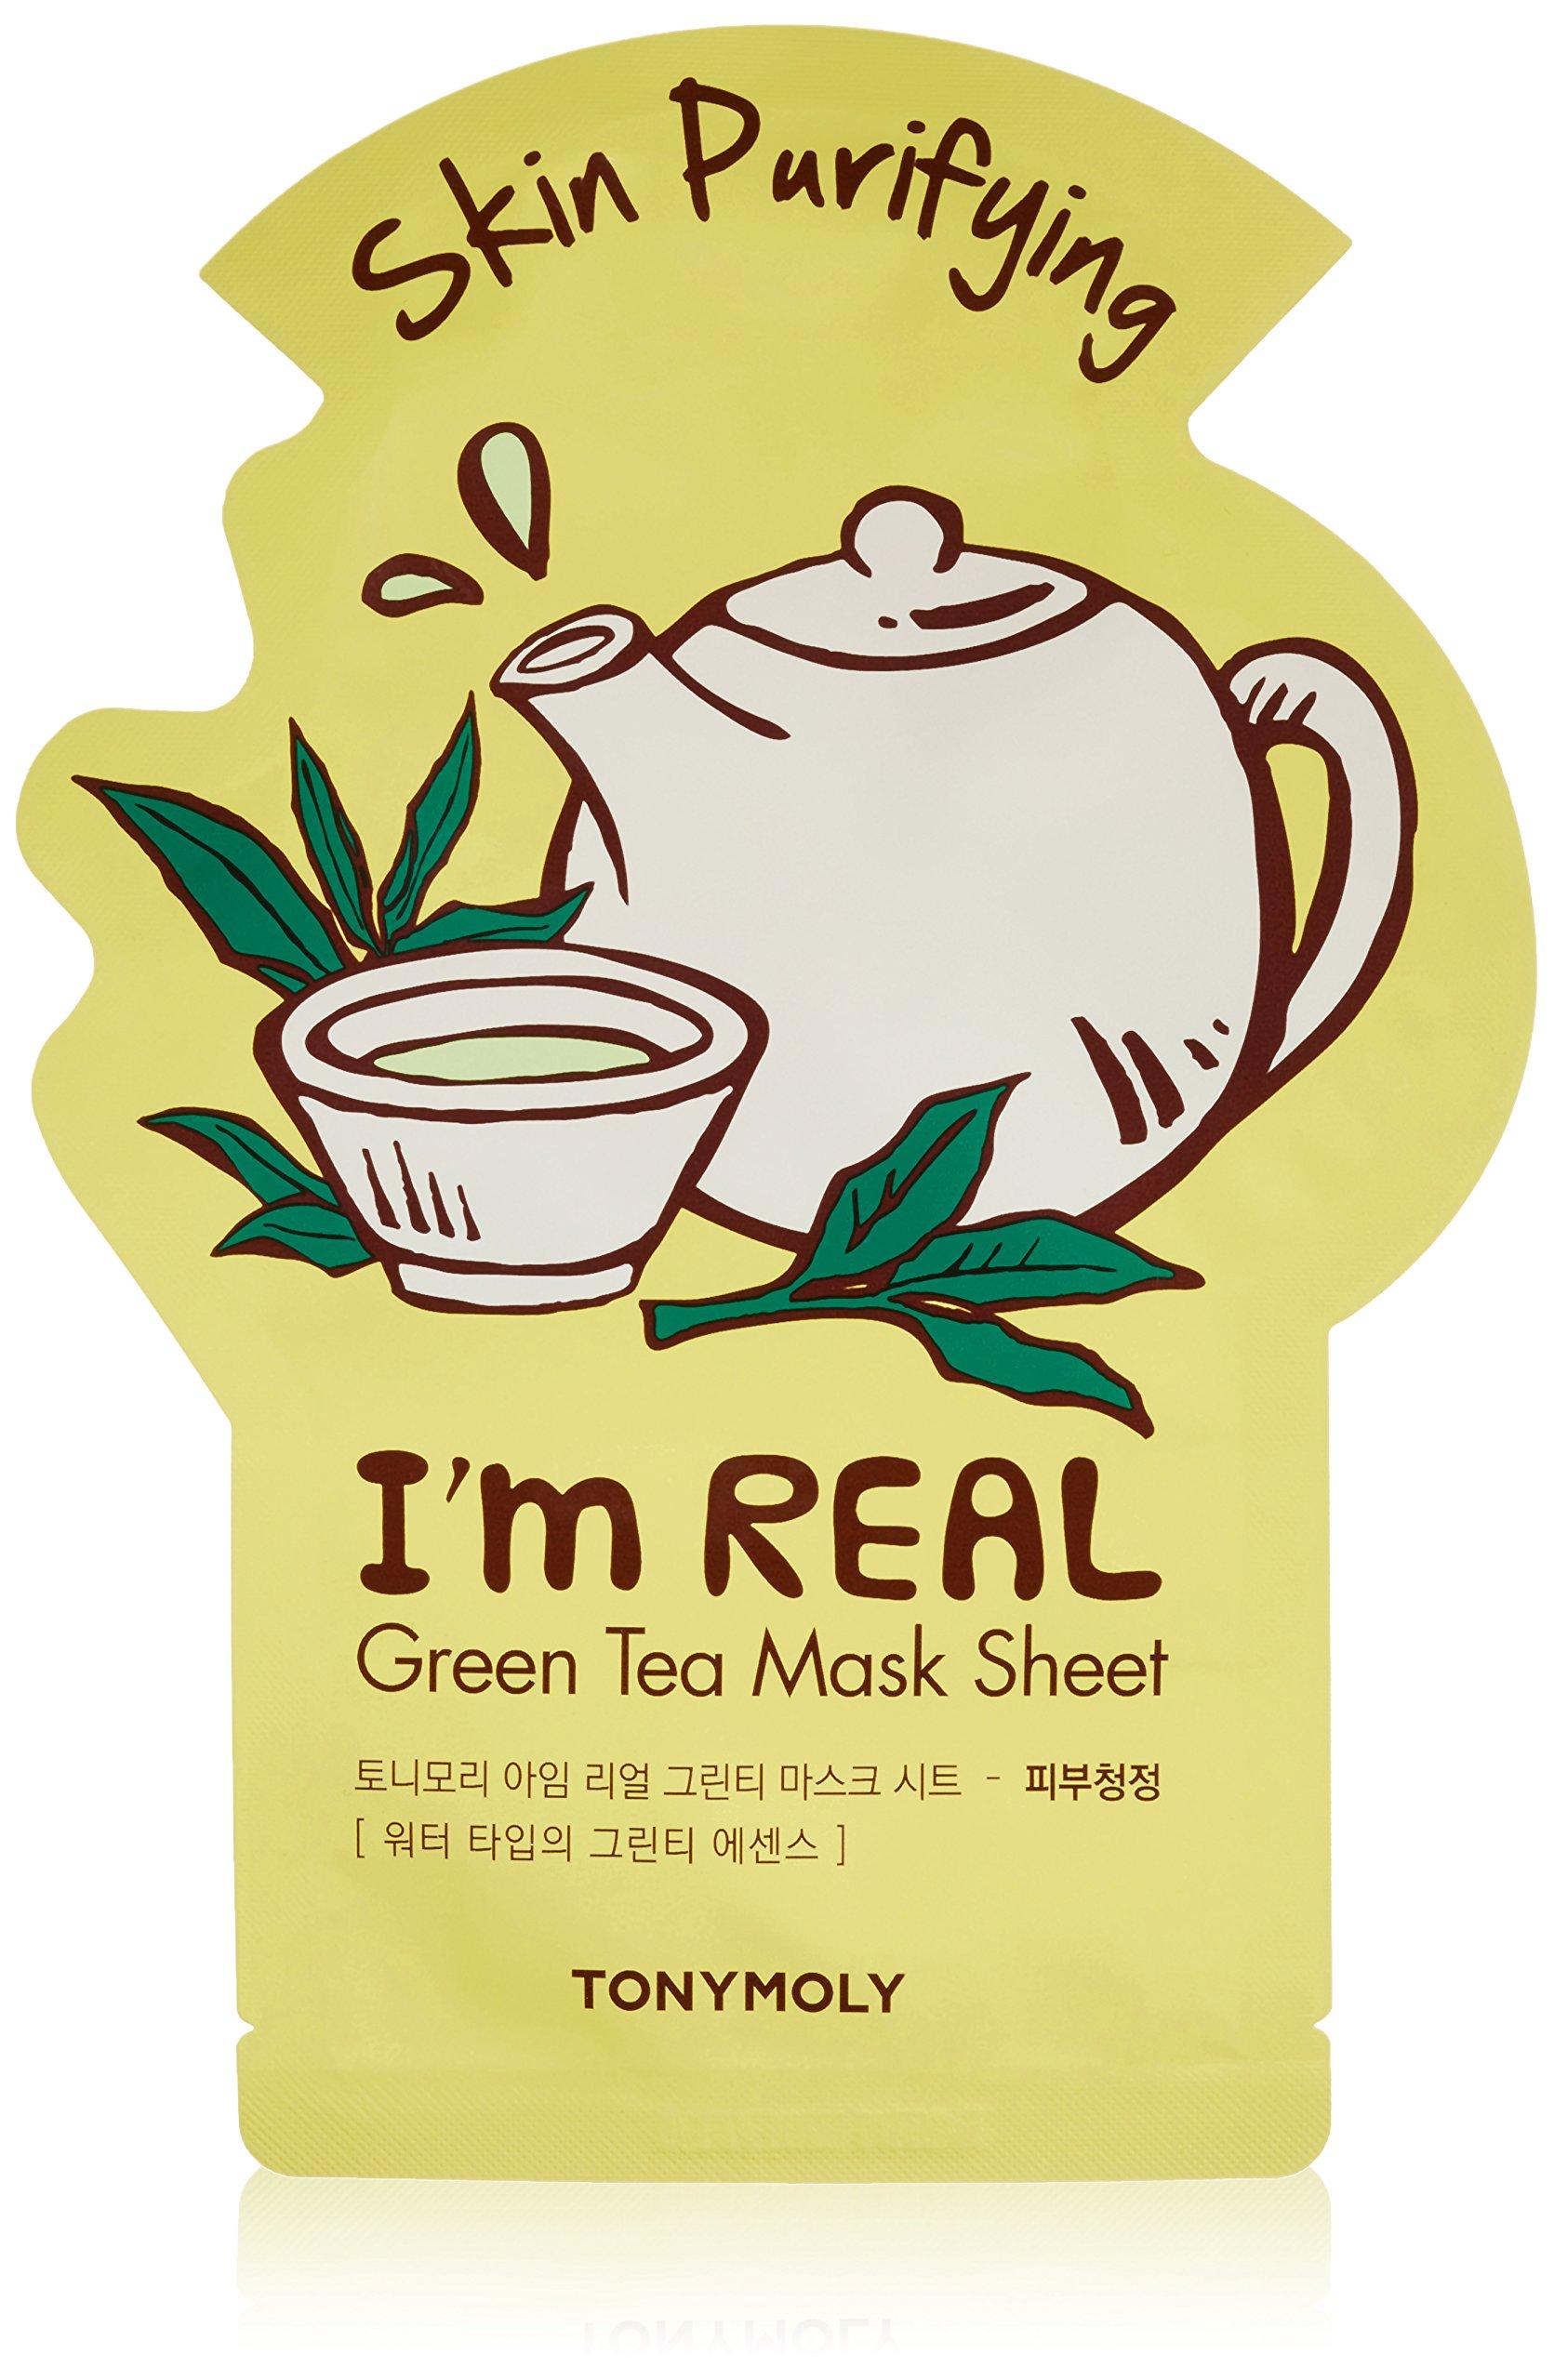 Tonymoly - TONYMOLY I'm Real Green Skin Purifying Tee Mask